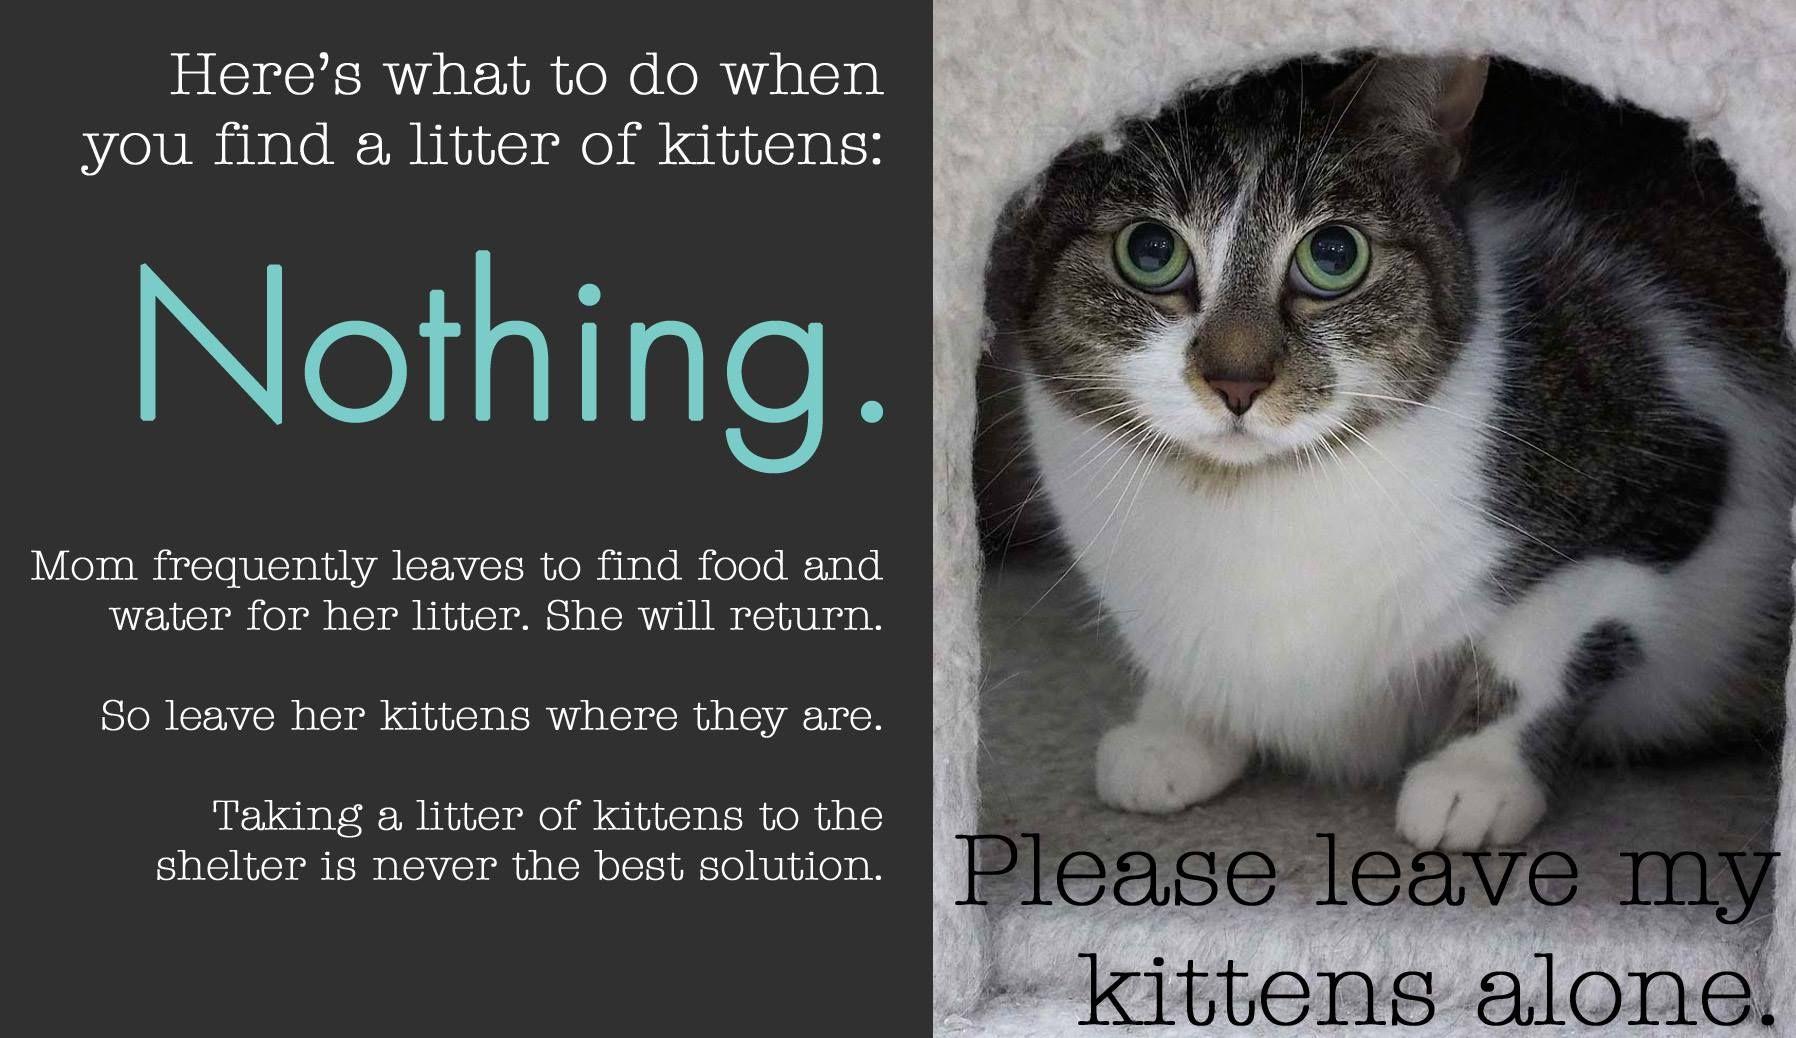 low cost spay/neuter clinics Dog clinic, Kitten season